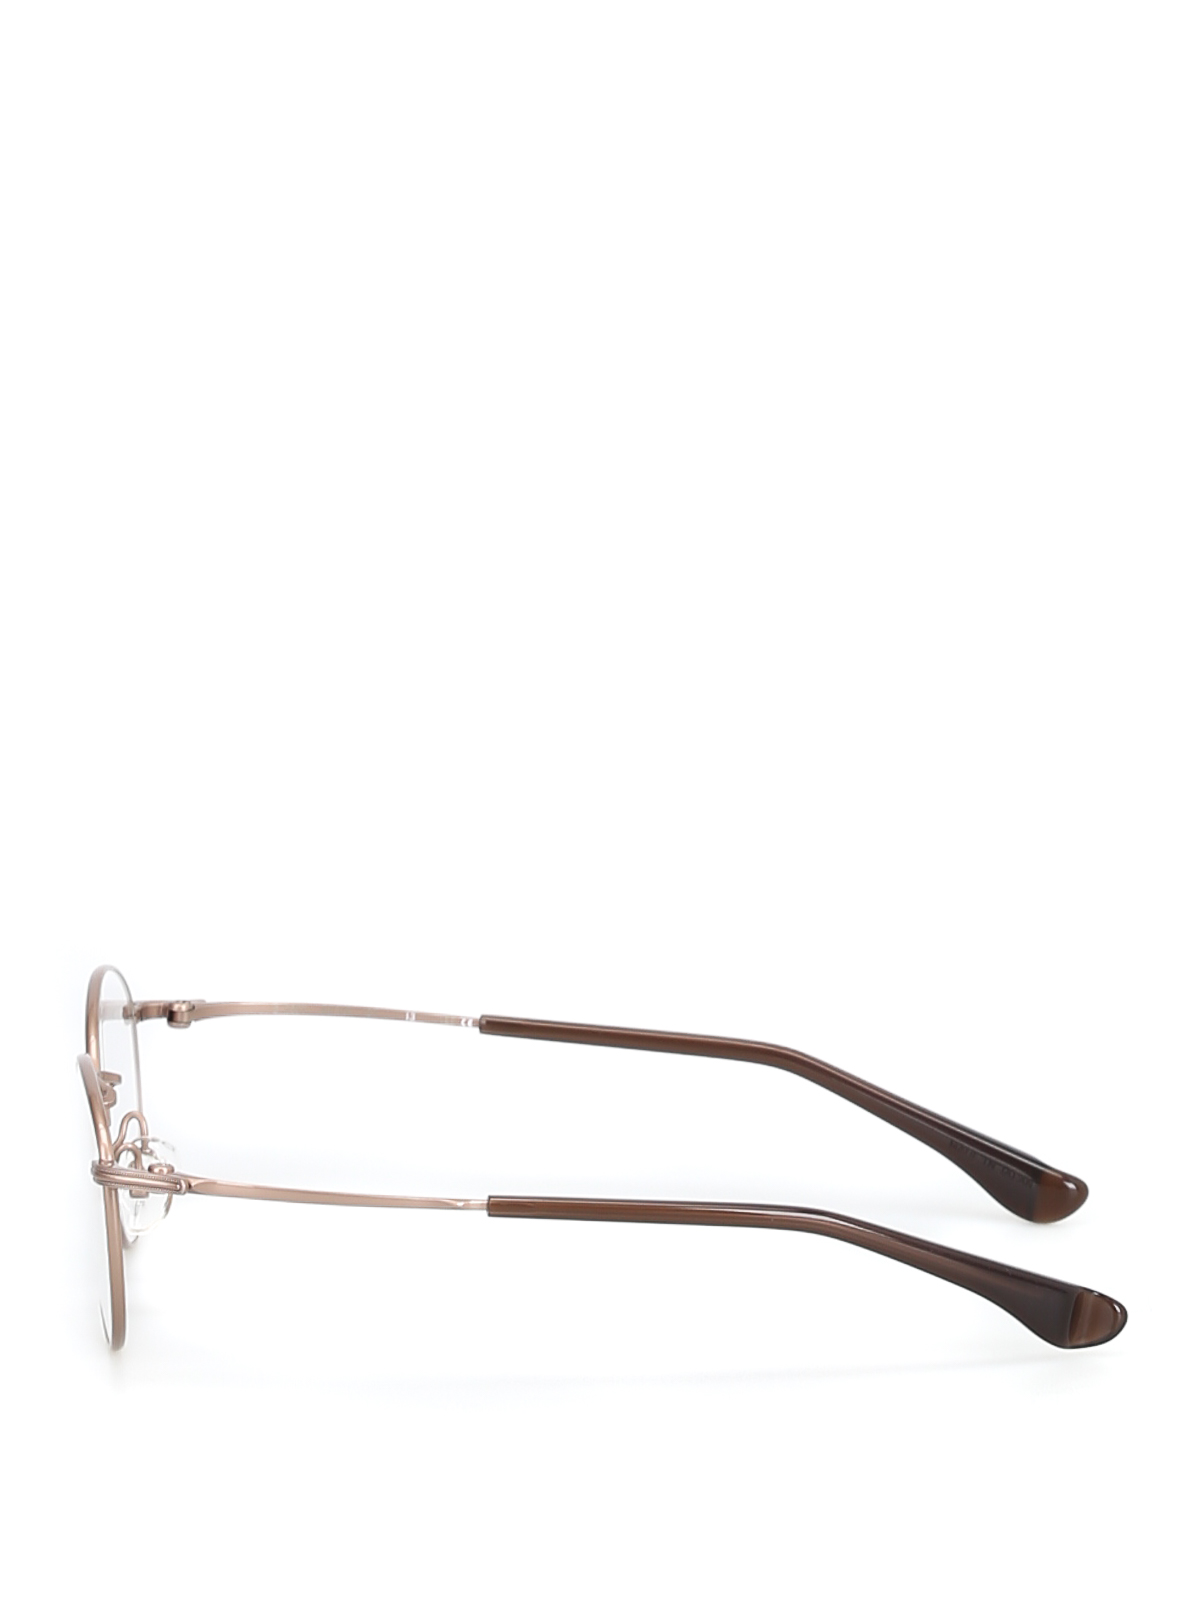 a6d66b83b7 999.9 FOUR NINES  Glasses online - Metal round slender frame eyeglasses